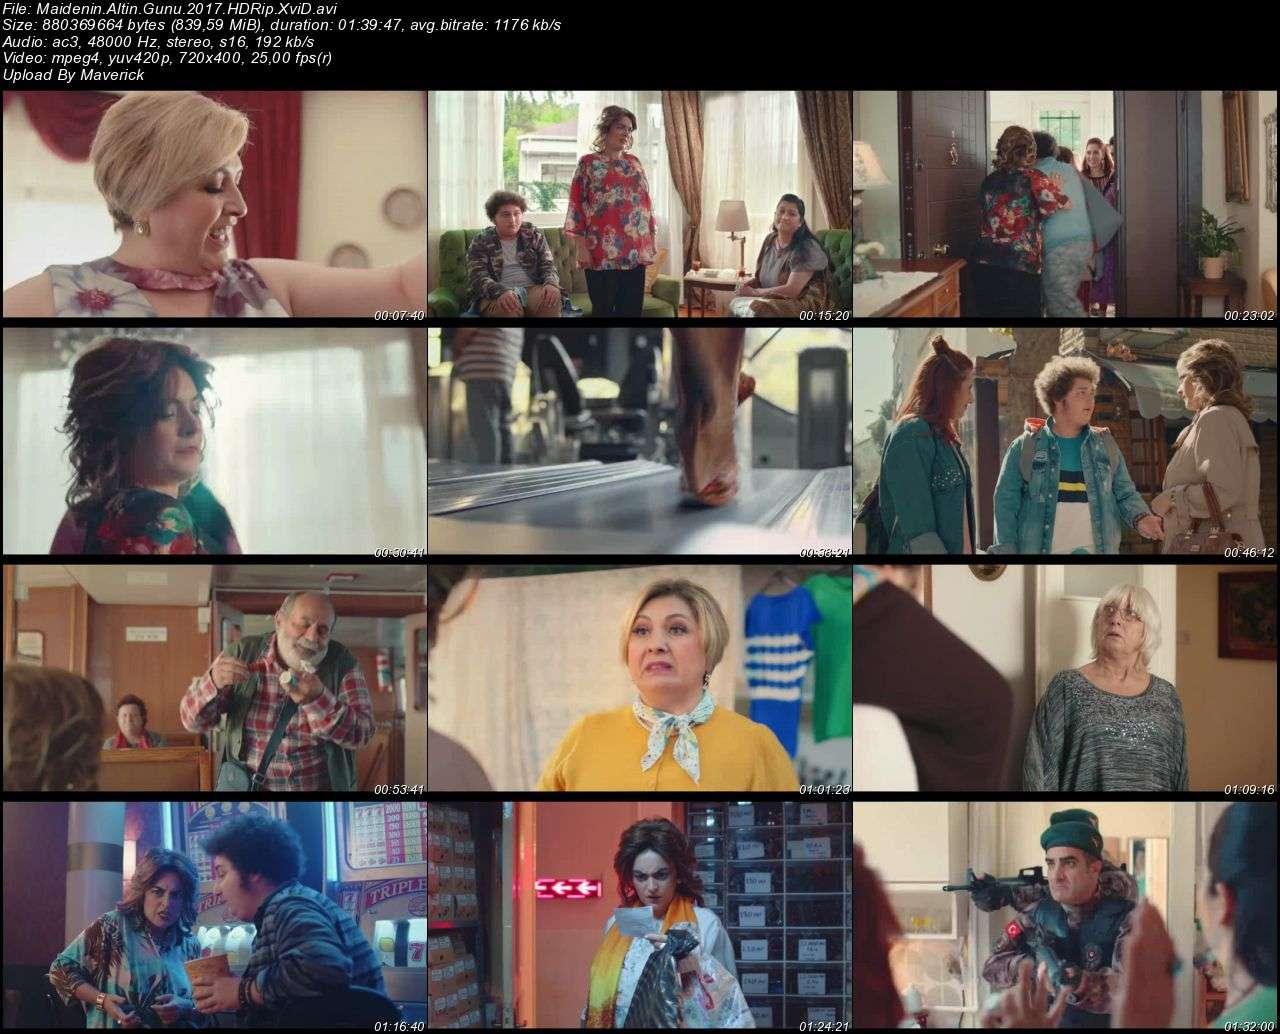 Maide'nin Altın Günü - 2017 (Yerli Film) HDRip XviD indir